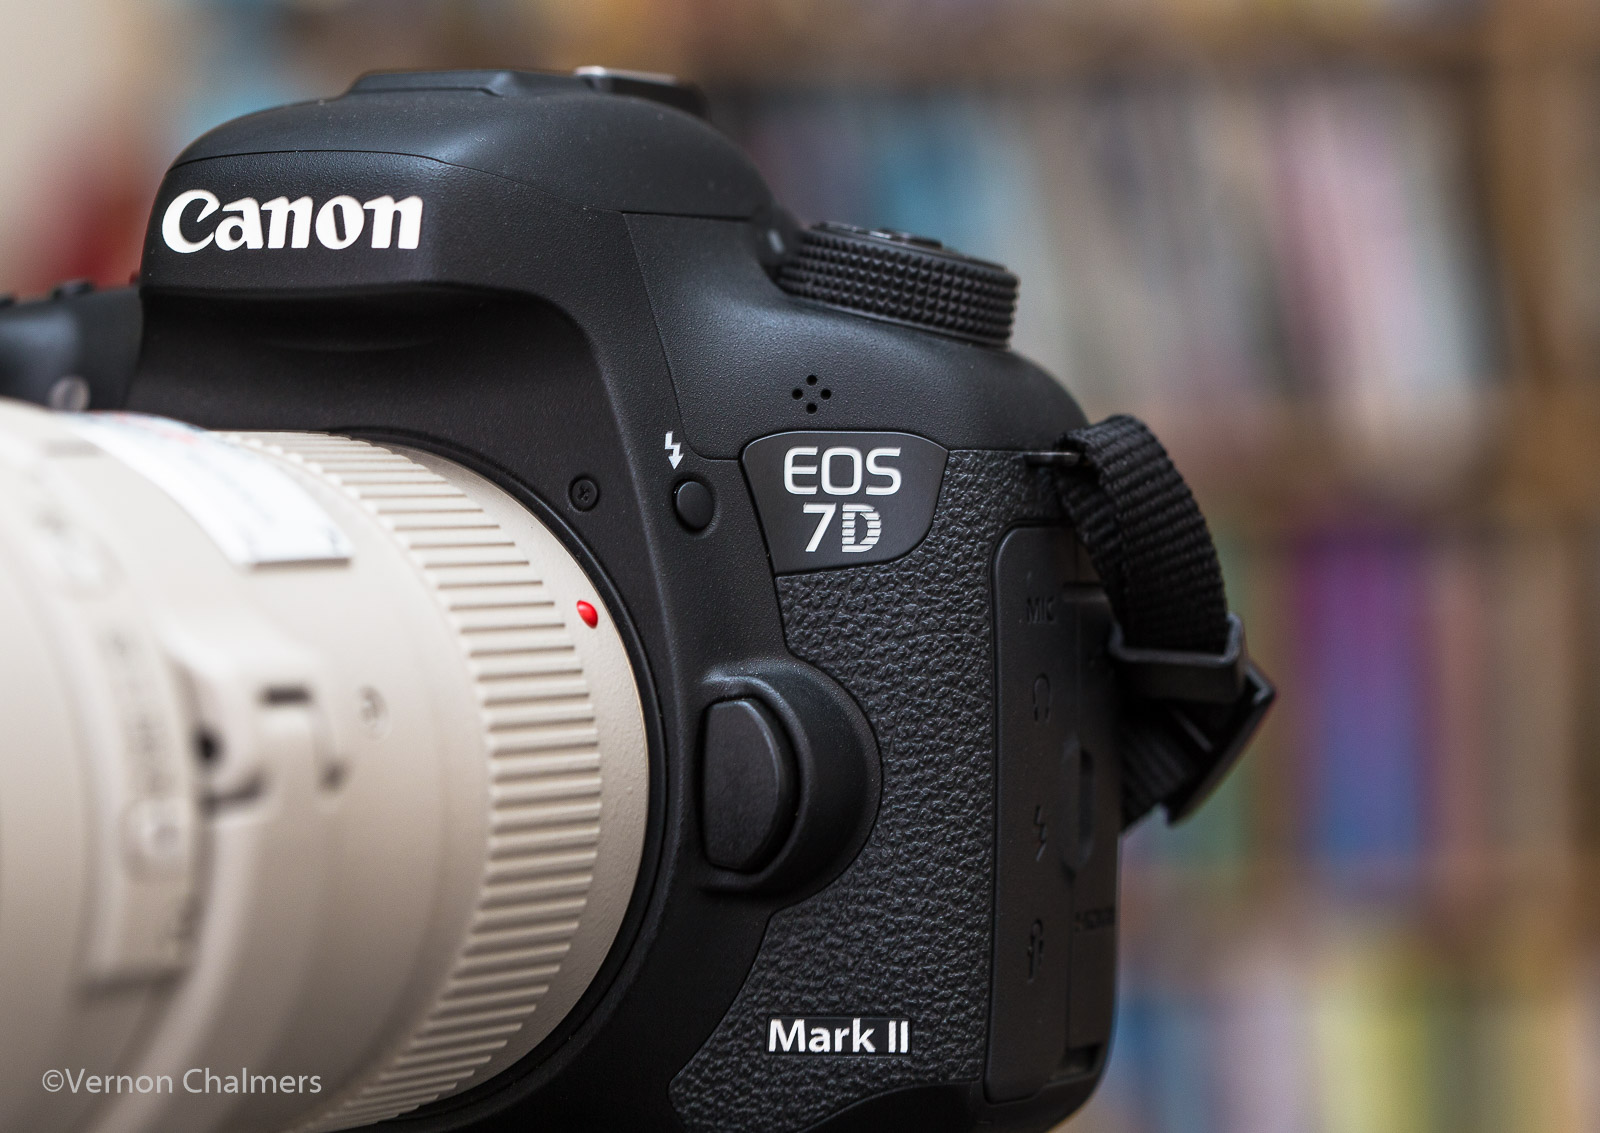 Canon Camera News 2018: Canon EOS 7D Mark II DSLR Camera